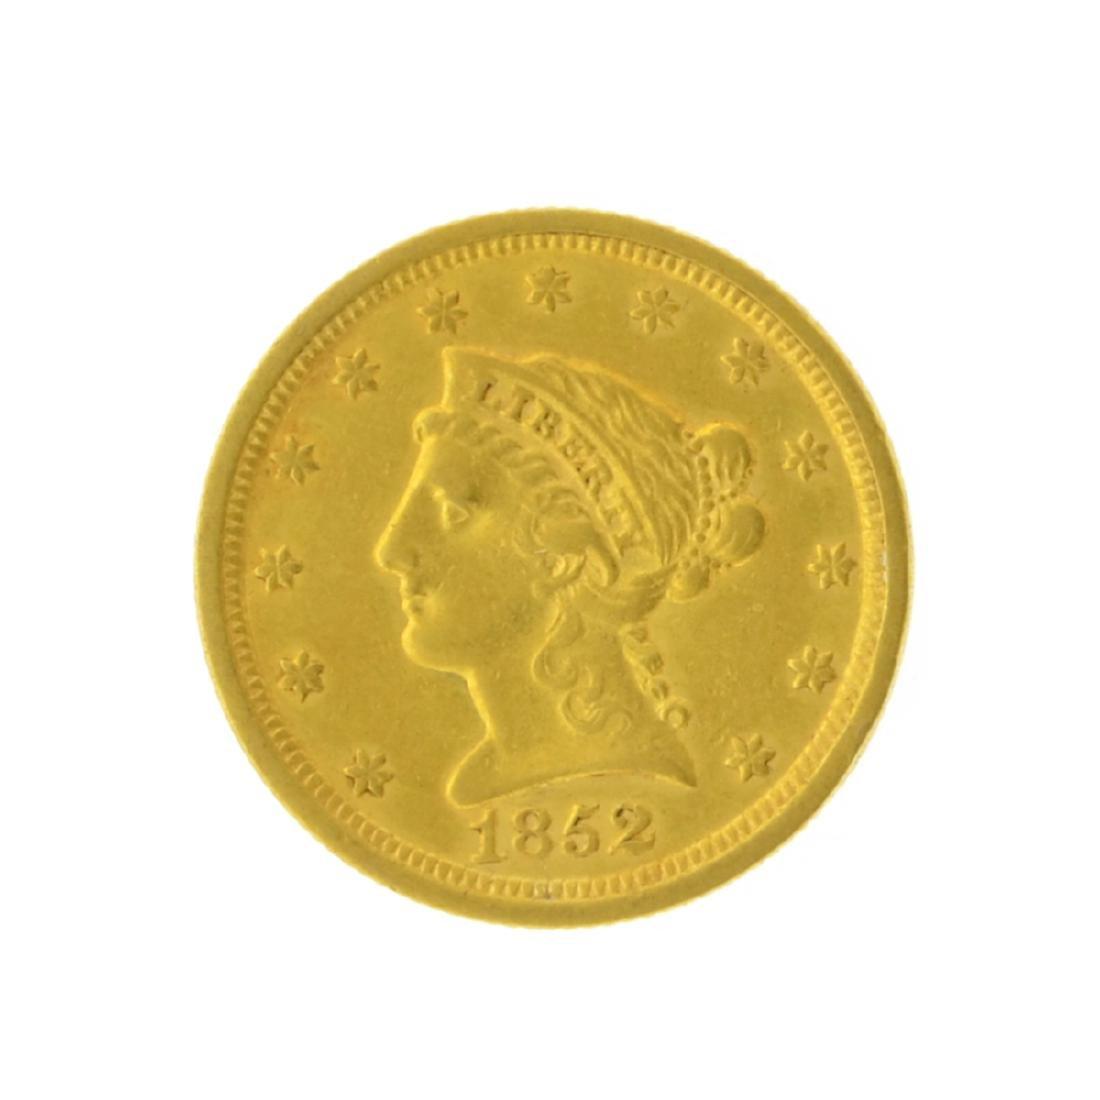 1852 $2.50 Liberty Head Gold Coin